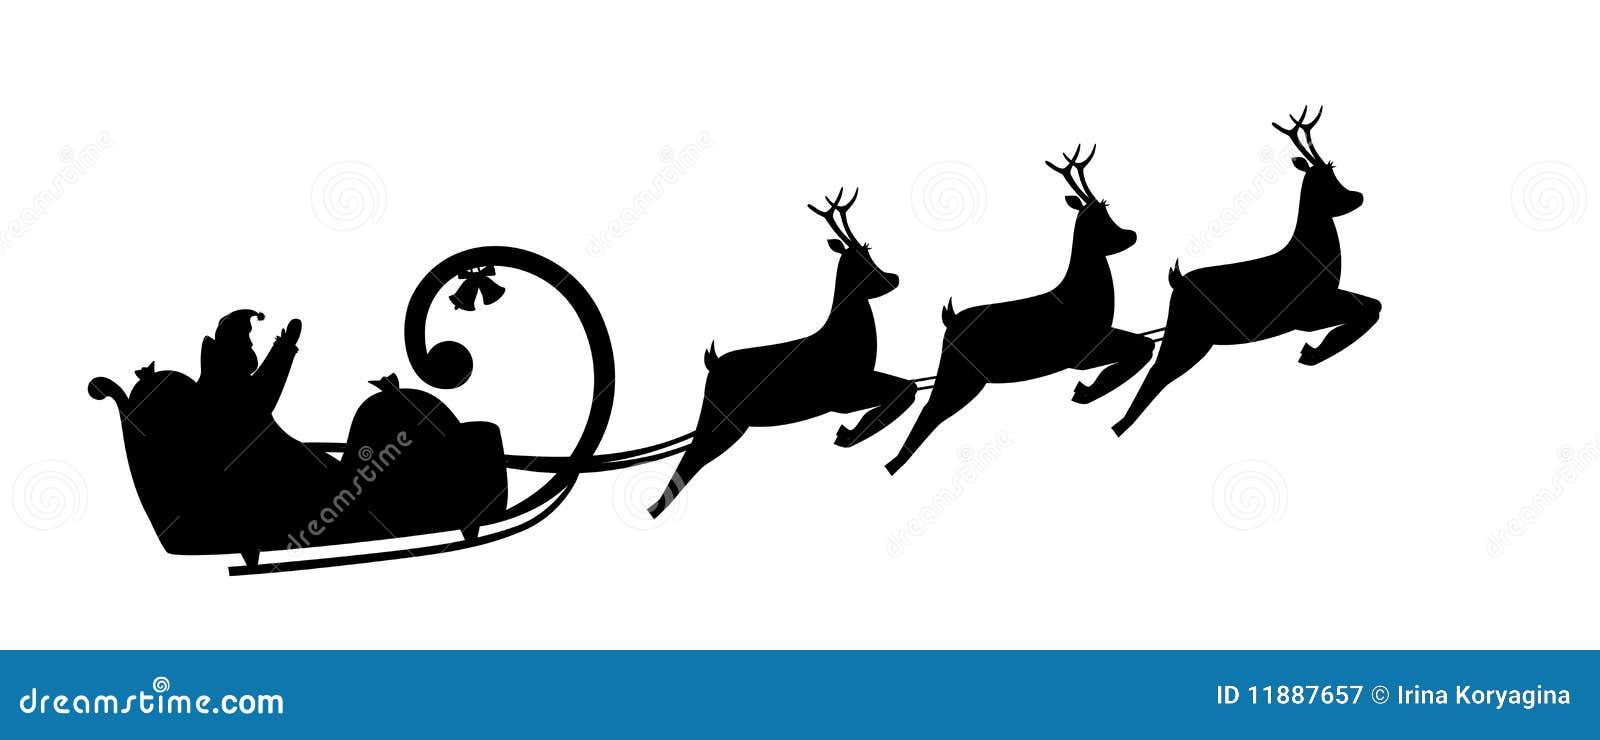 Free Santa Silhouette | Search Results | Calendar 2015